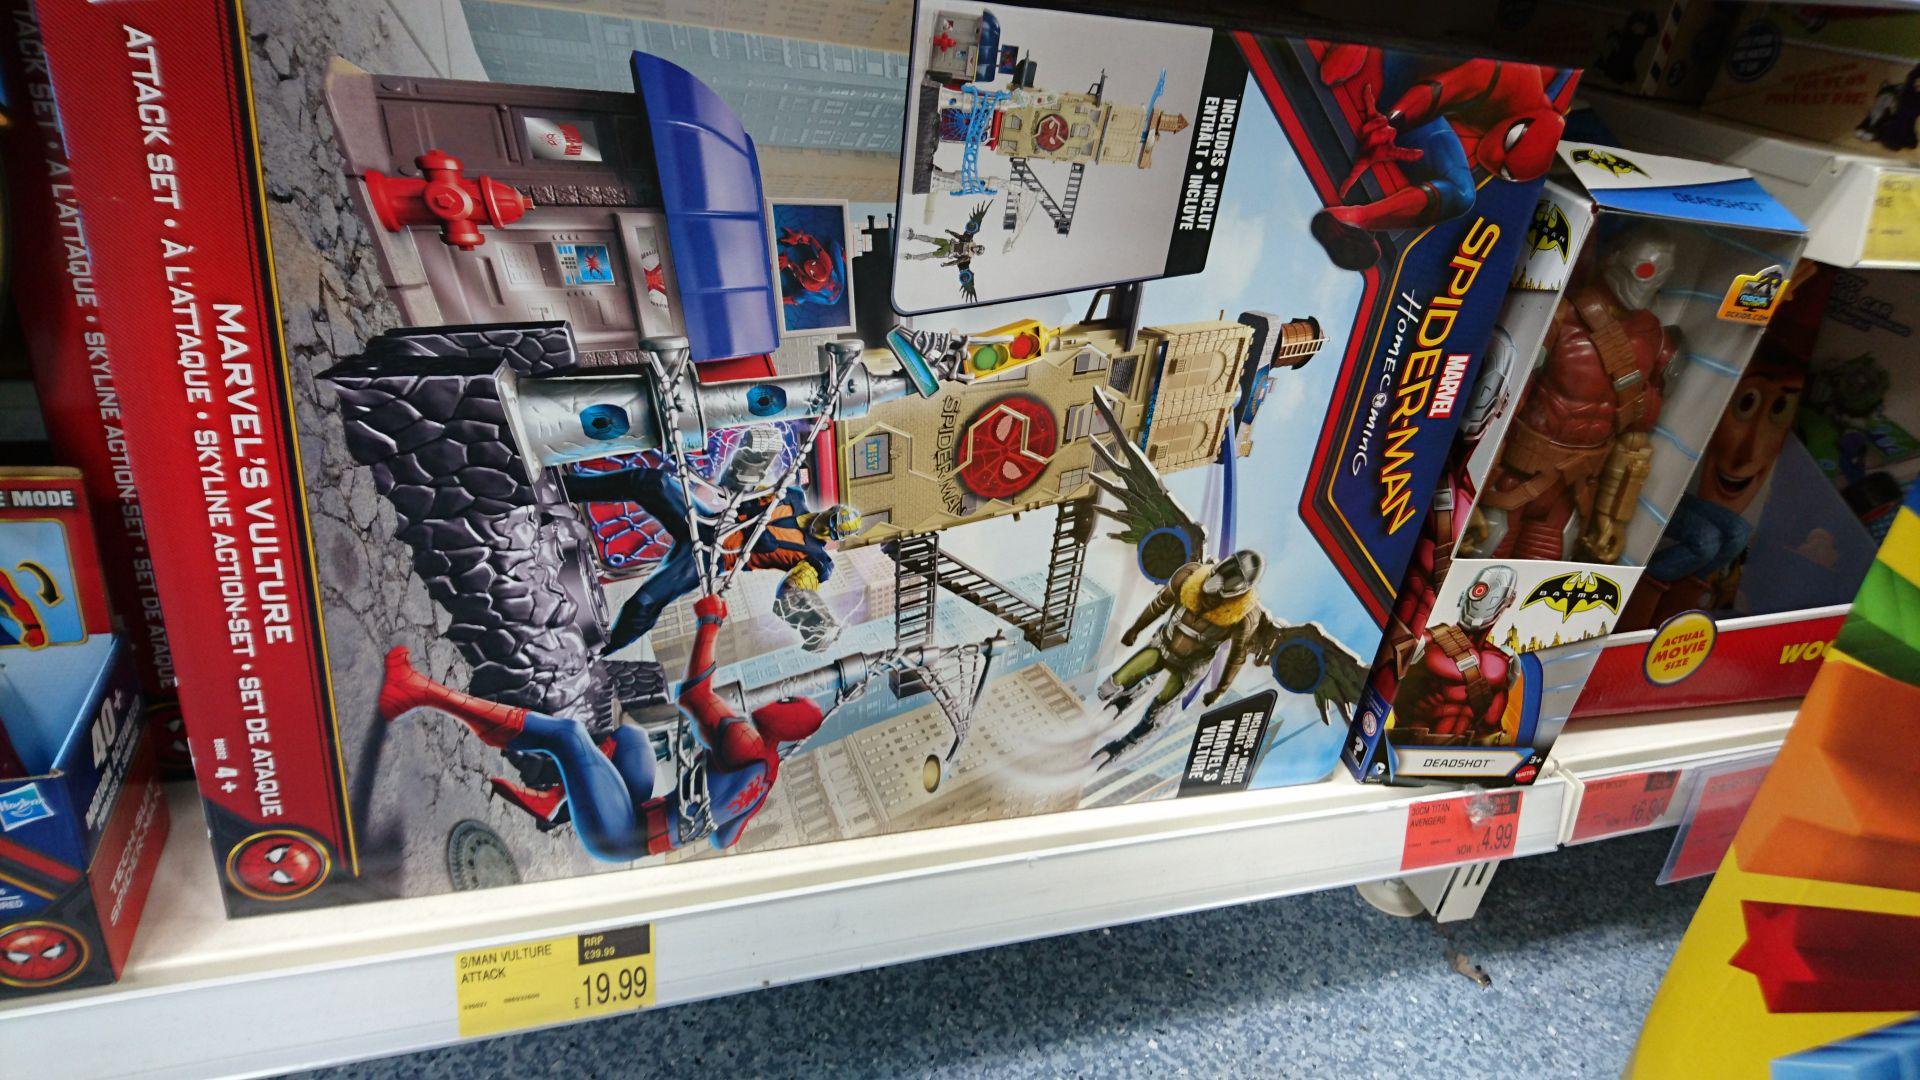 Spiderman vulture attack - £19.99 instore @ b&m Bromborough / wirral - £19.99